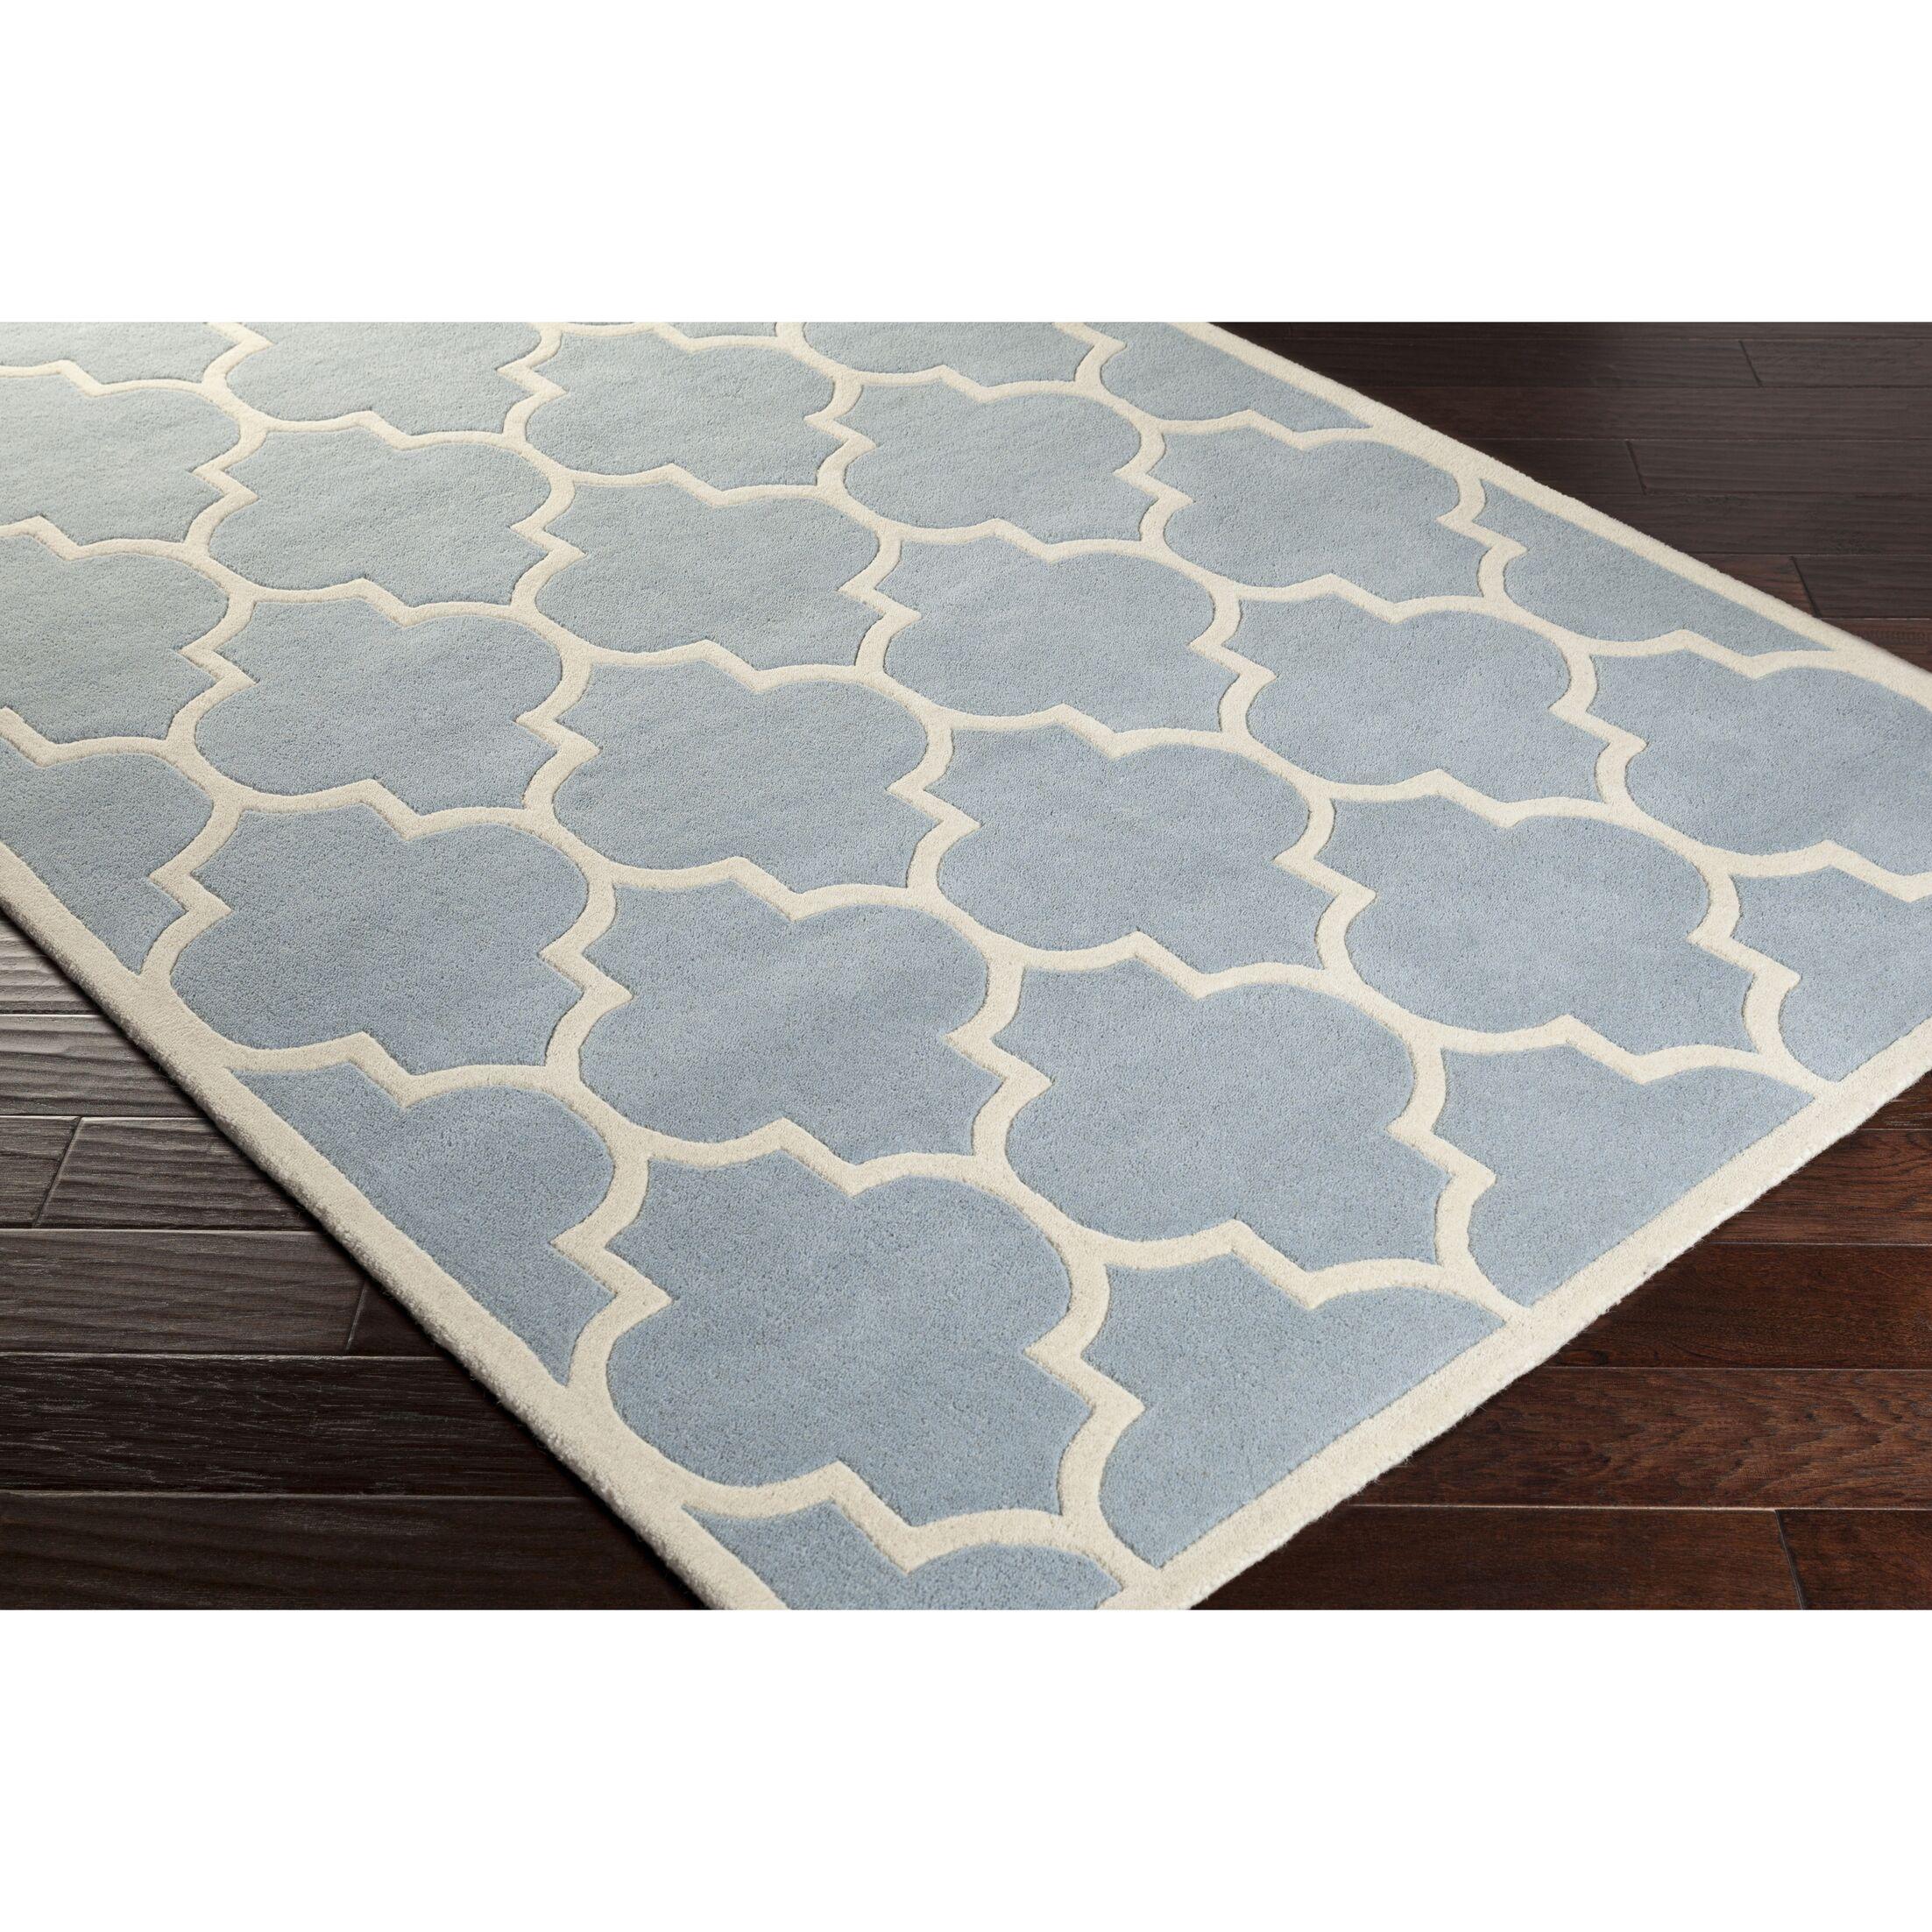 Ayler Blue Geometric Area Rug Rug Size: Rectangle 6' x 9'